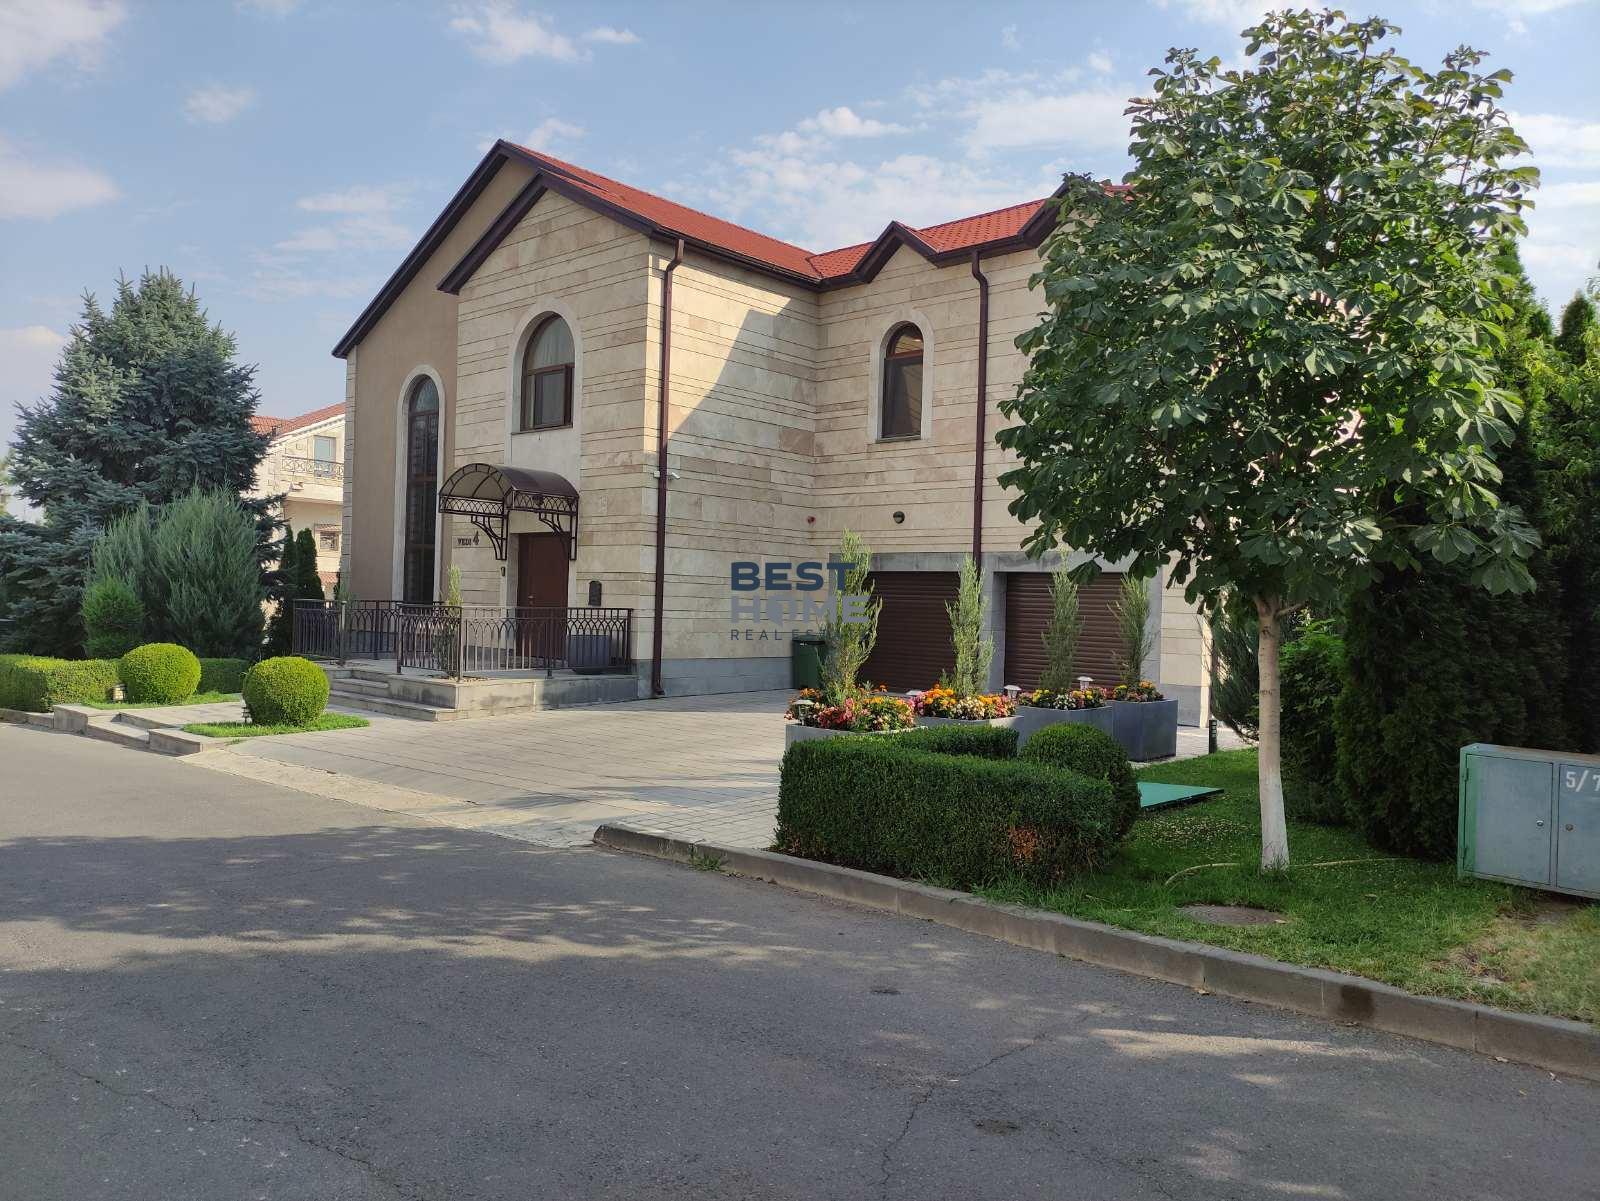 Villa house in Vahagni Armenia for sale or rent